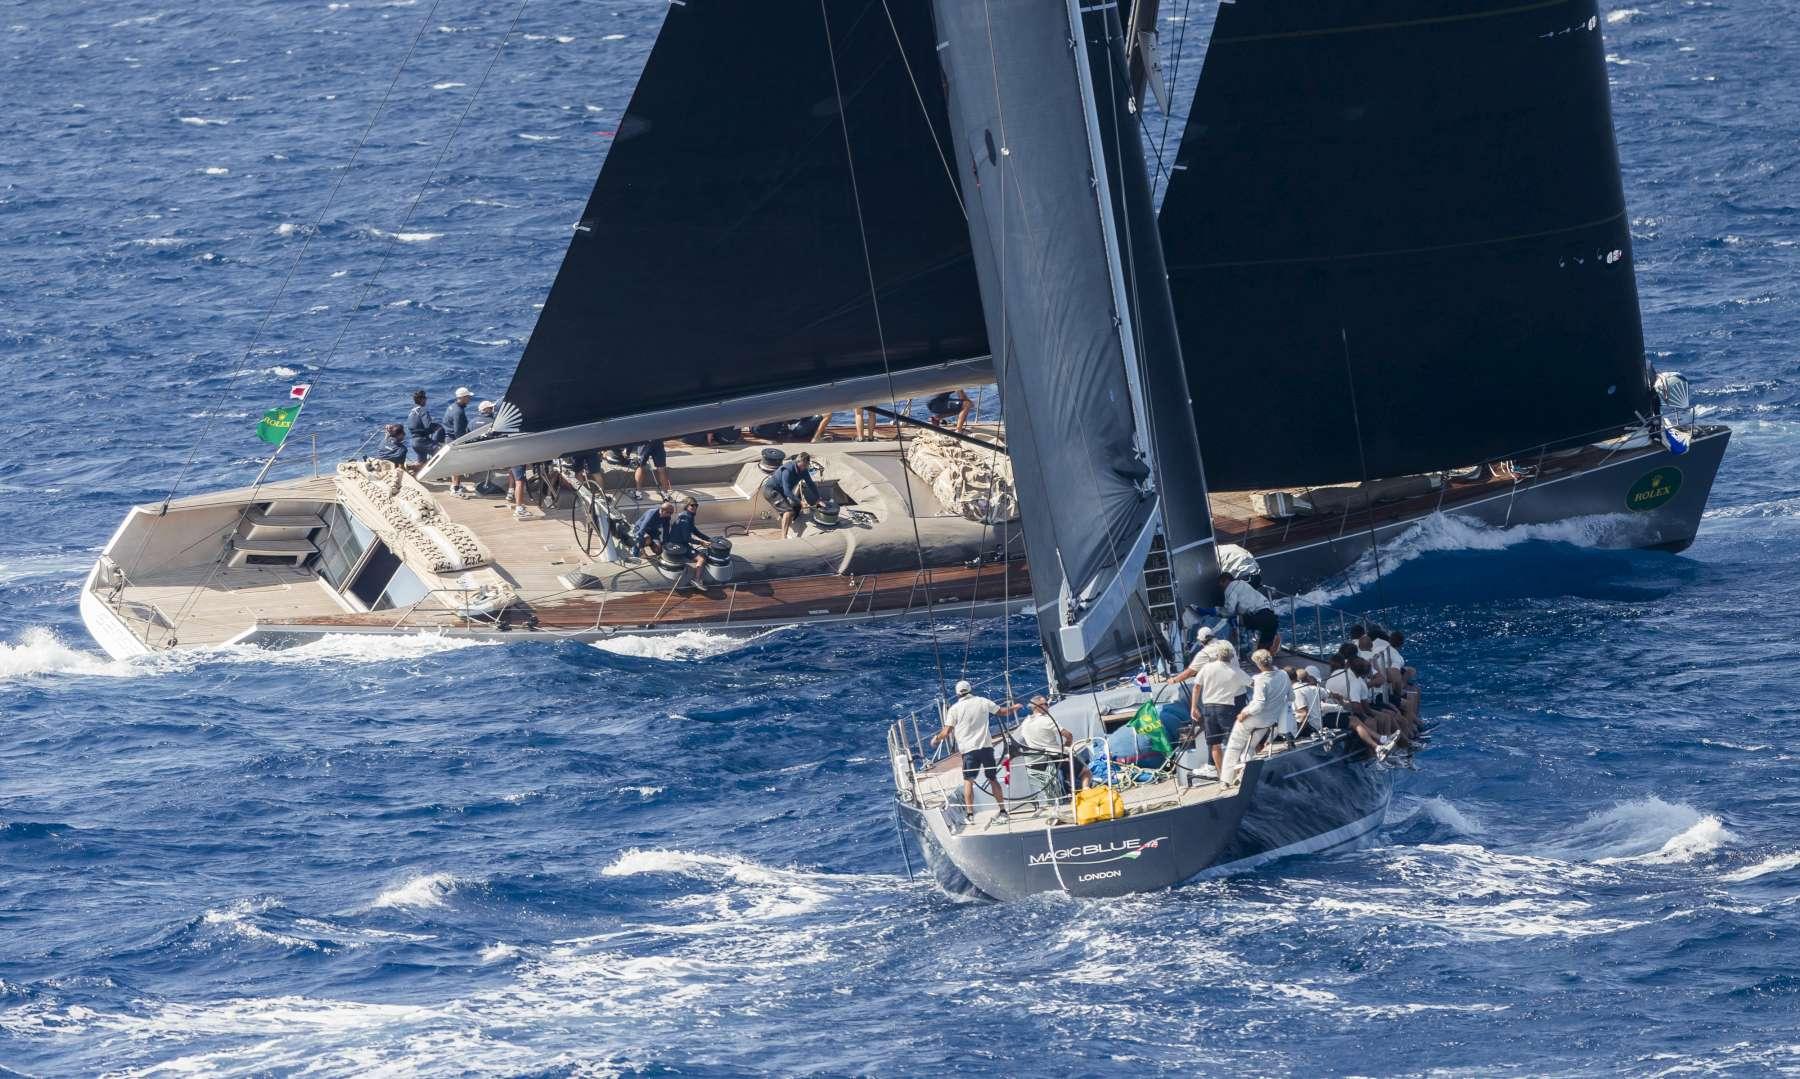 Maxi Yacht Rolex Cup 07 09 2017 Borlenghi 13